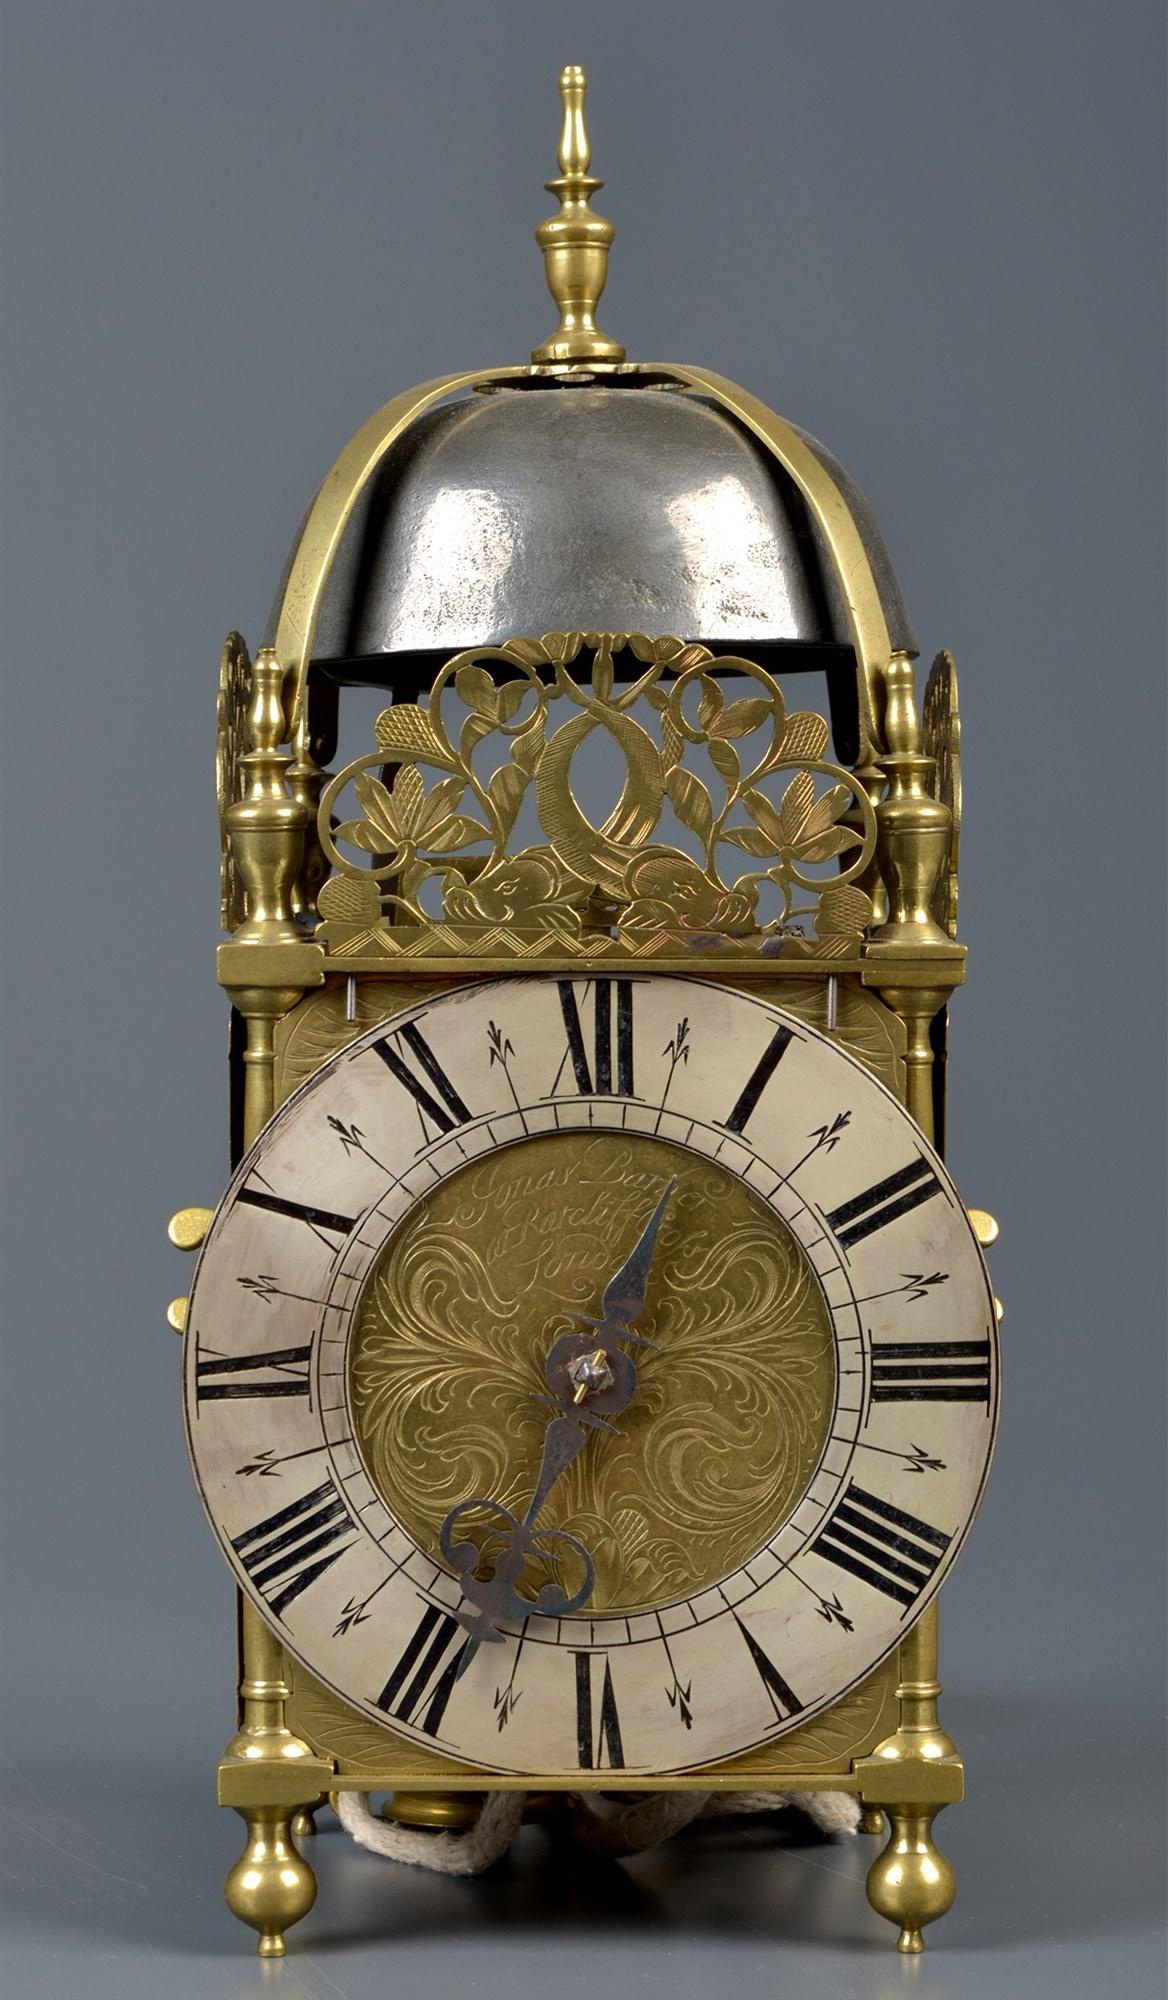 Jonas Barber, London: a brass lantern clock